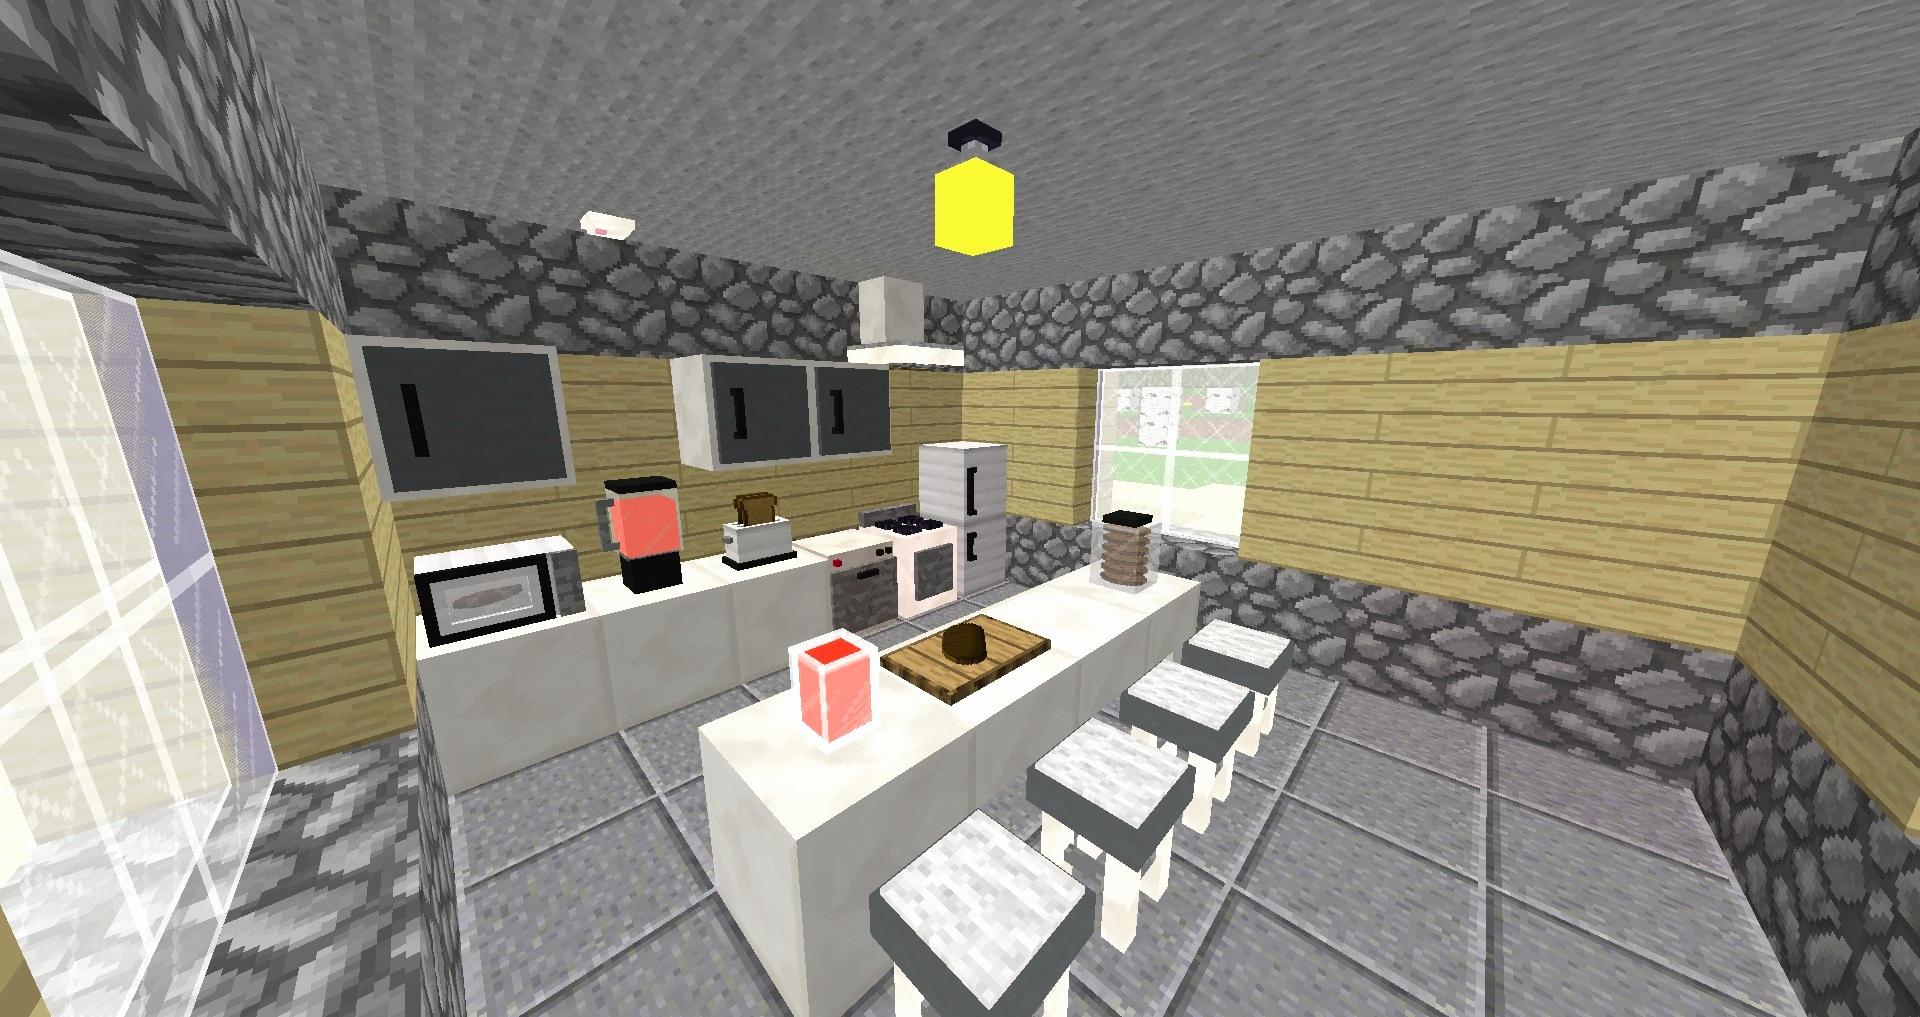 Deco Cuisine Minecraft Meilleur De Image Cuisine Moderne Minecraft Meilleur De 50 Génial Cuisine Minecraft S